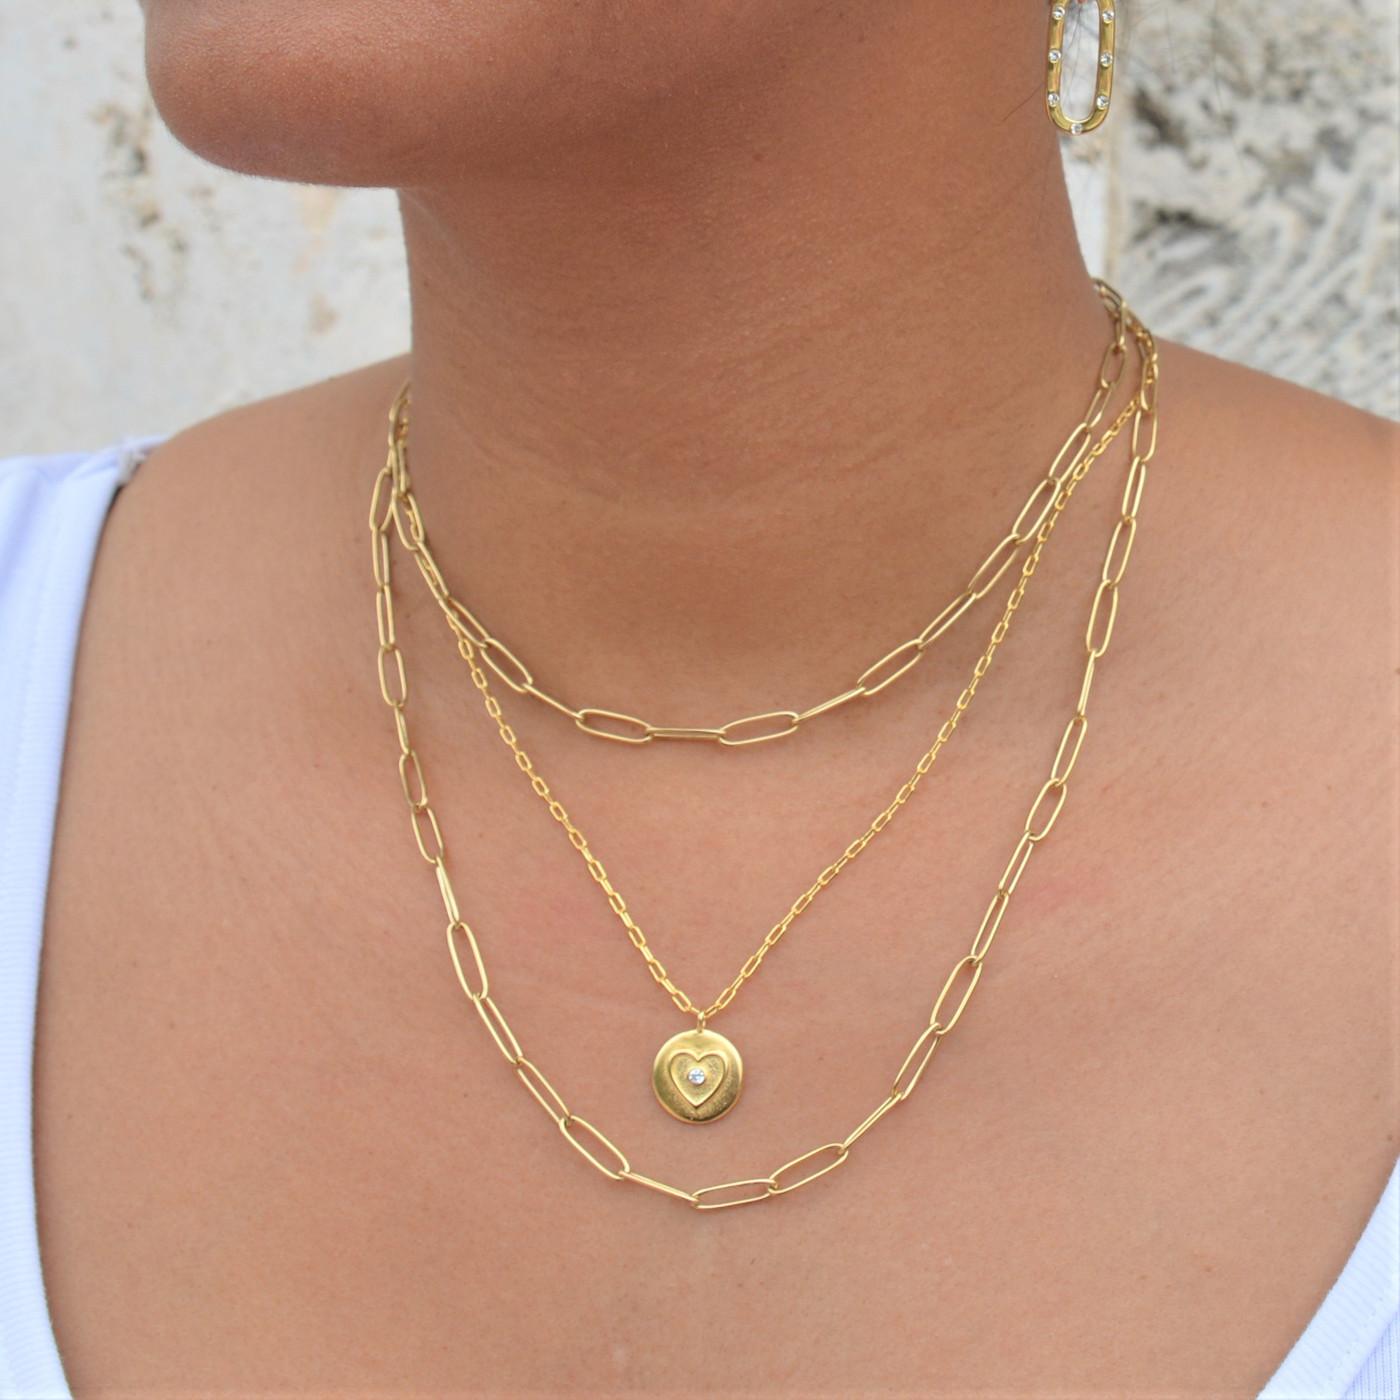 Icon Chain Necklace